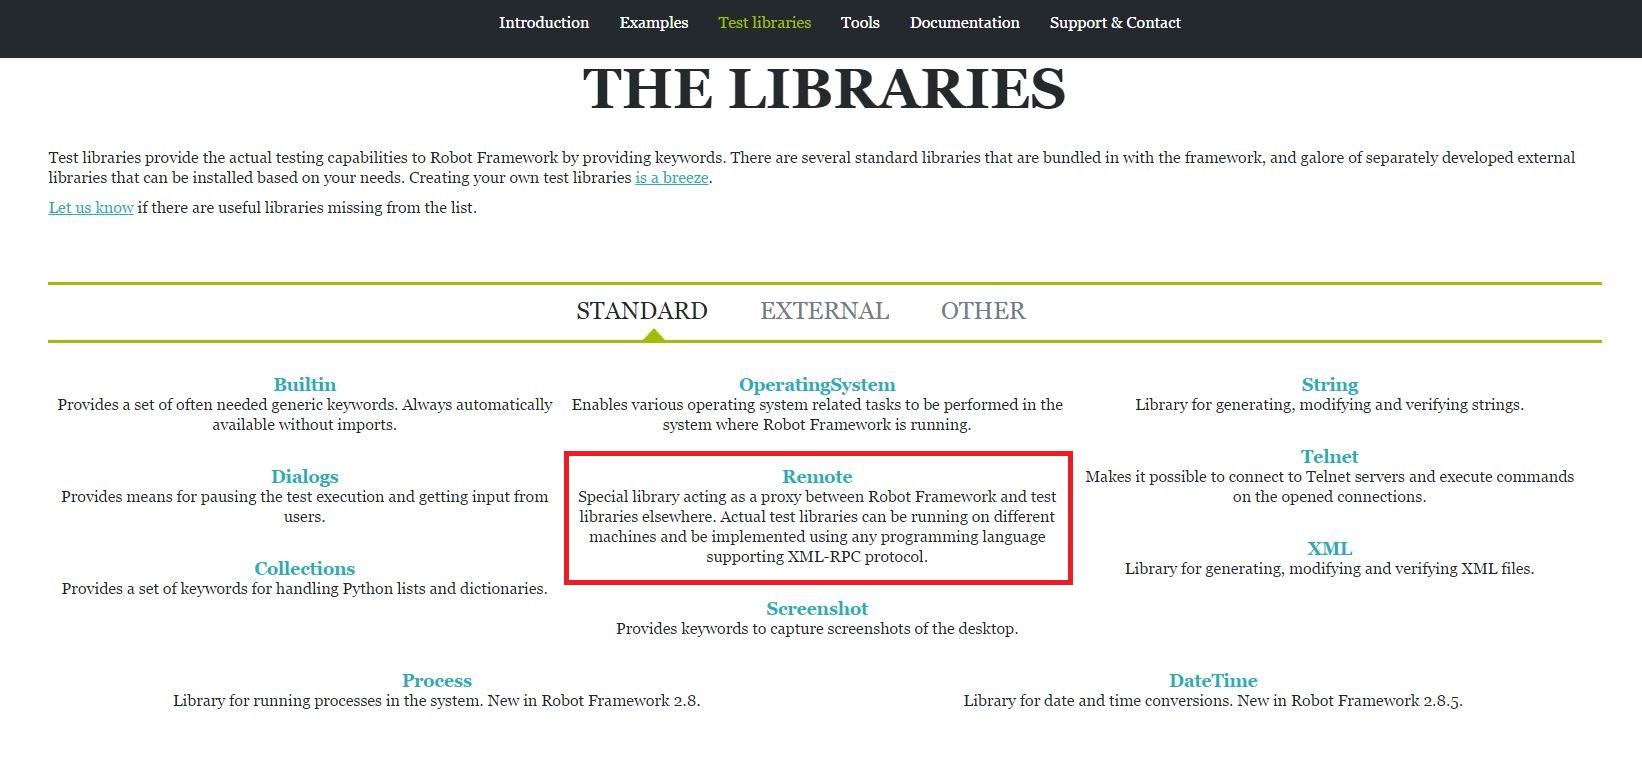 Standard libraries